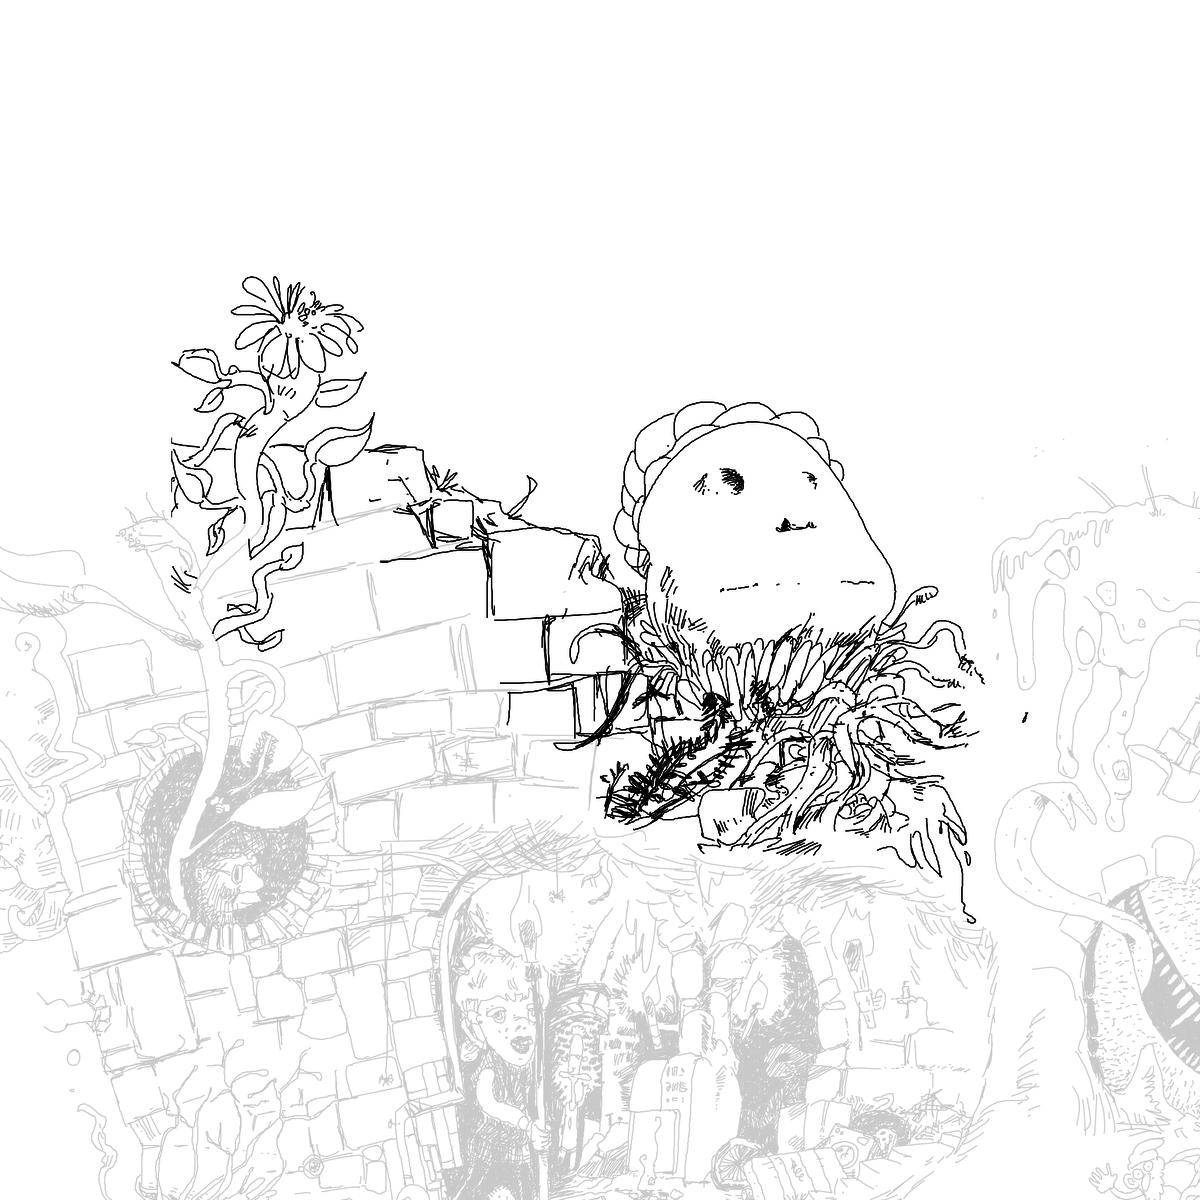 BAAAM drawing#6310 lat:78.4207534790039000lng: -4.4897861480712890